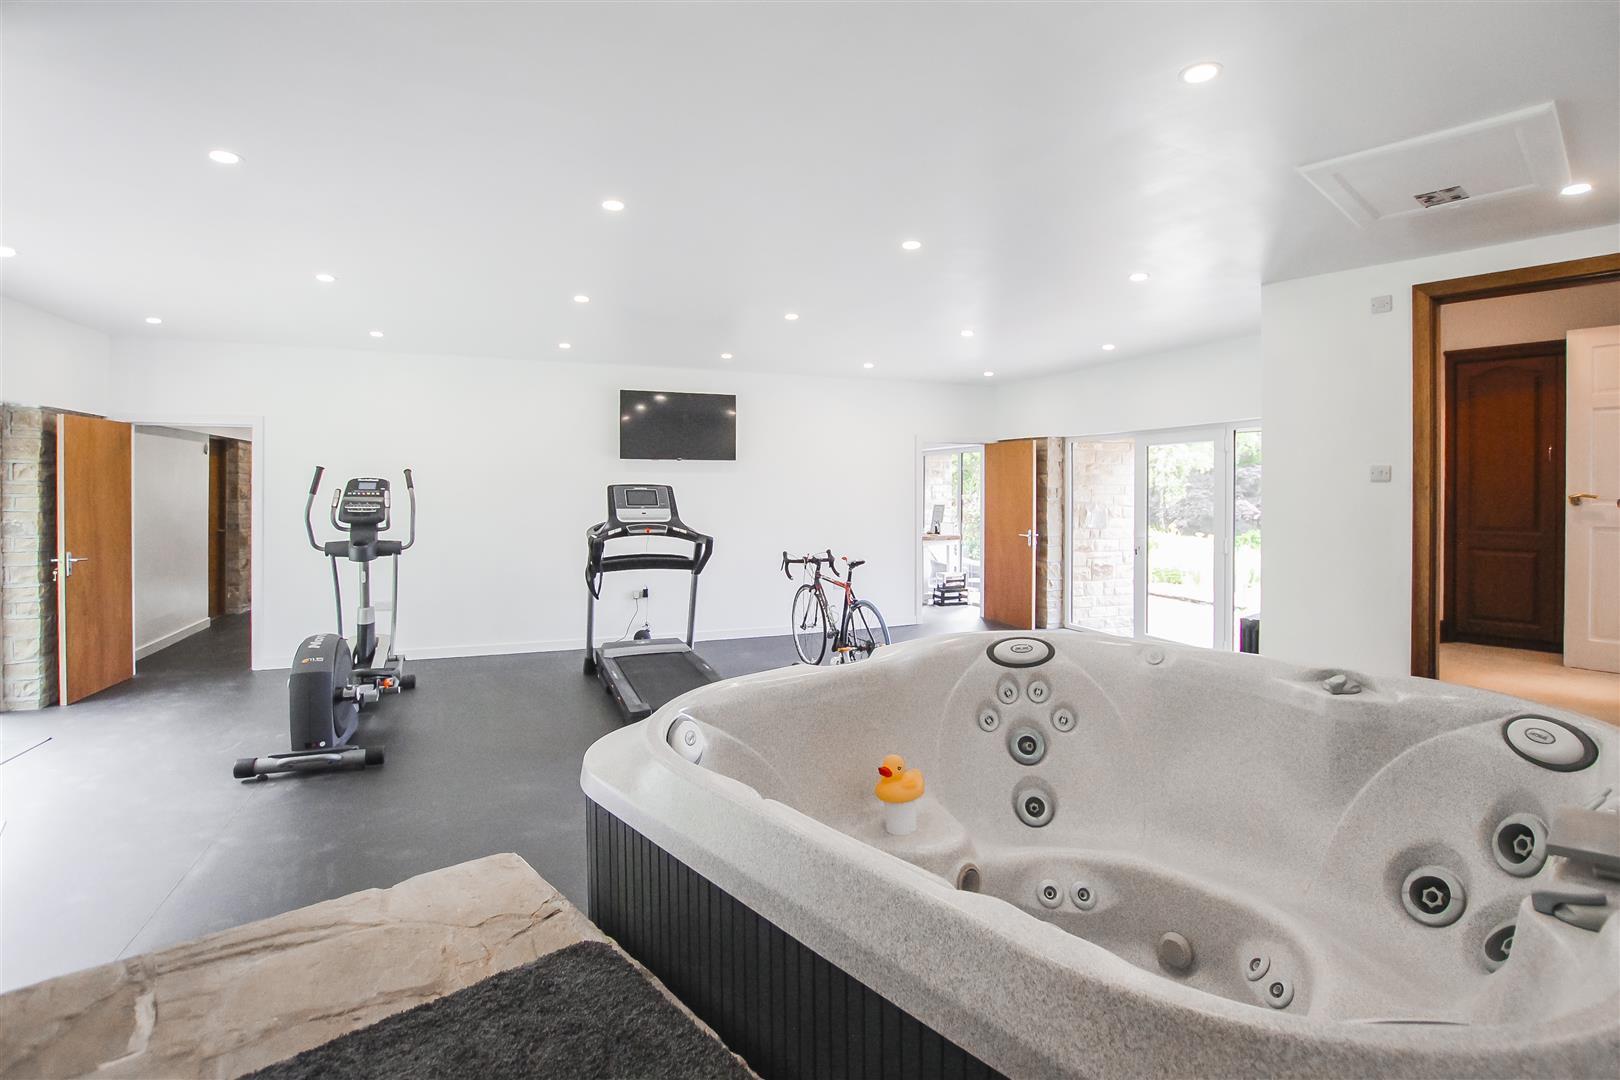 6 Bedroom Detached House For Sale - Gym